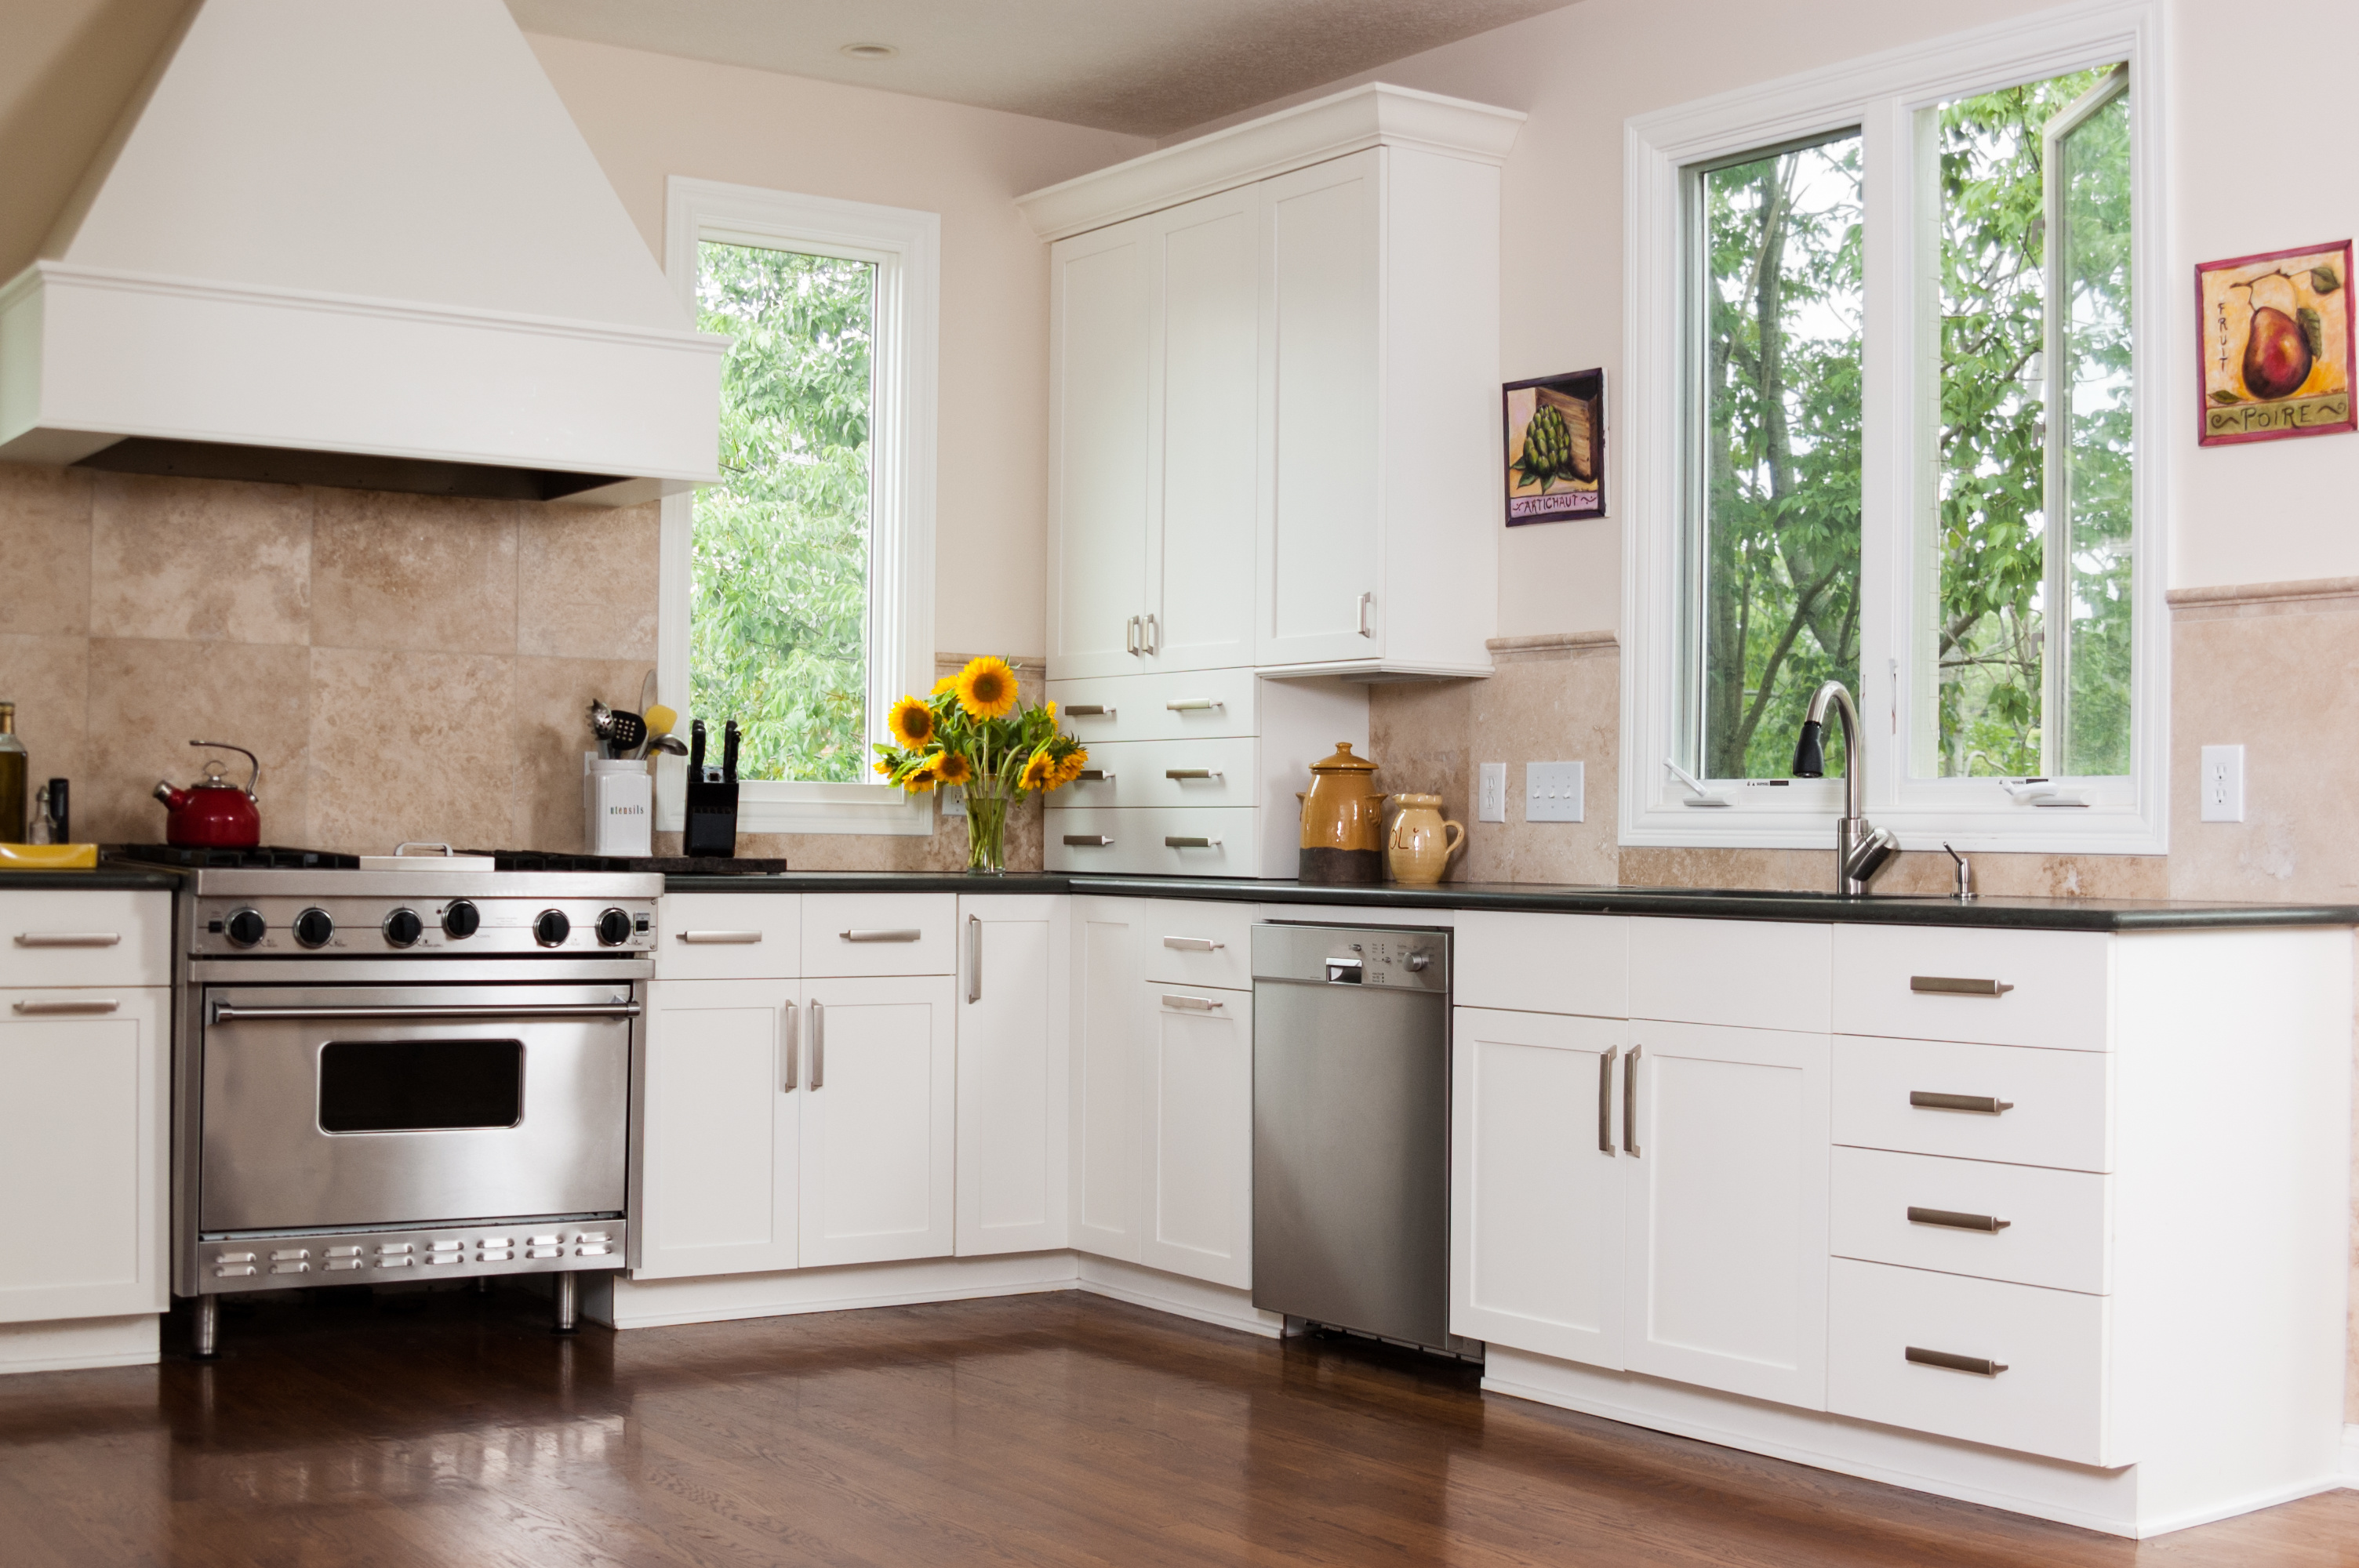 jk kitchen cabinets with How To Create Classic Kitchen Styles on 6046839981 also Grey Shaker moreover Jk Cabi s Pompano likewise Phoenix Arizona likewise J K Place Capri Hotel Elegant Seaside Decor.